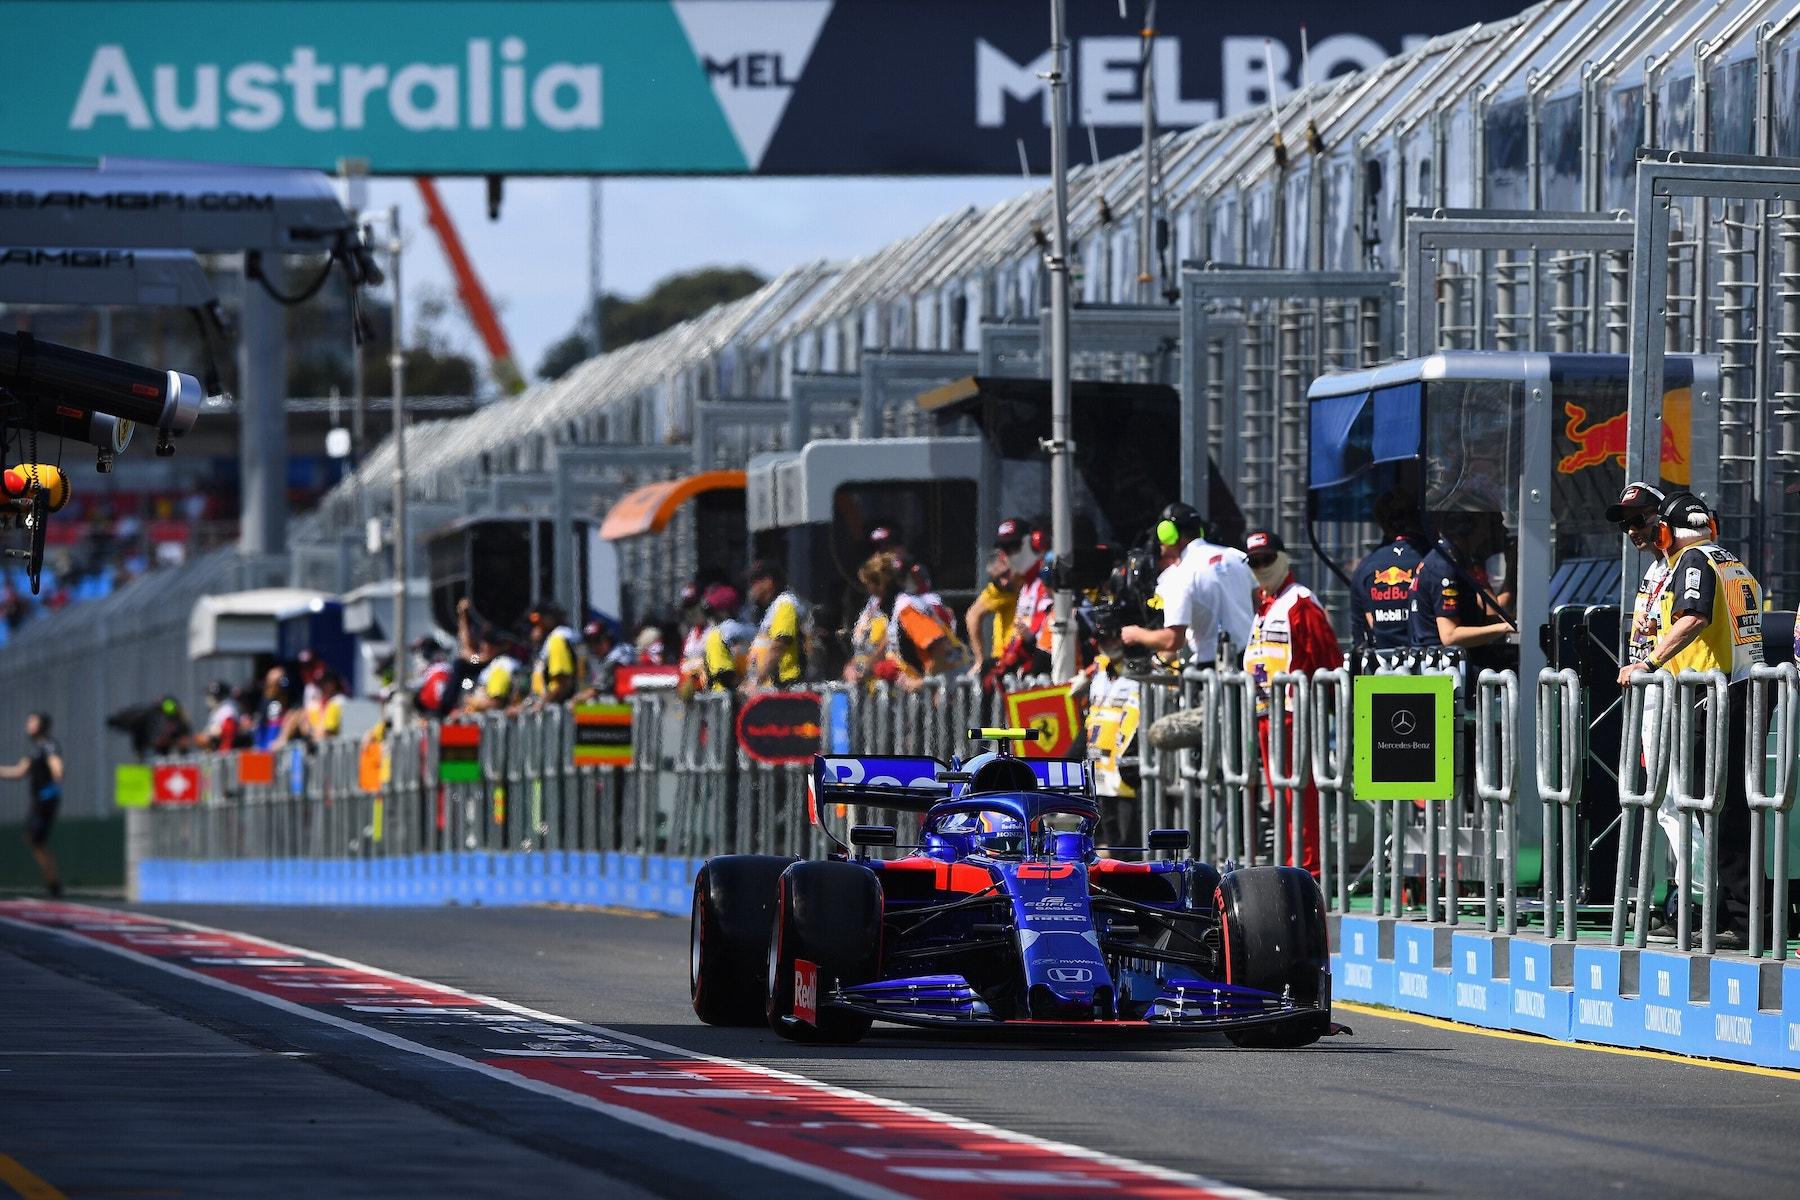 B 2019 Alex Albon | Toro Rosso STR14 | 2019 Australian GP FP1 2 copy.jpg